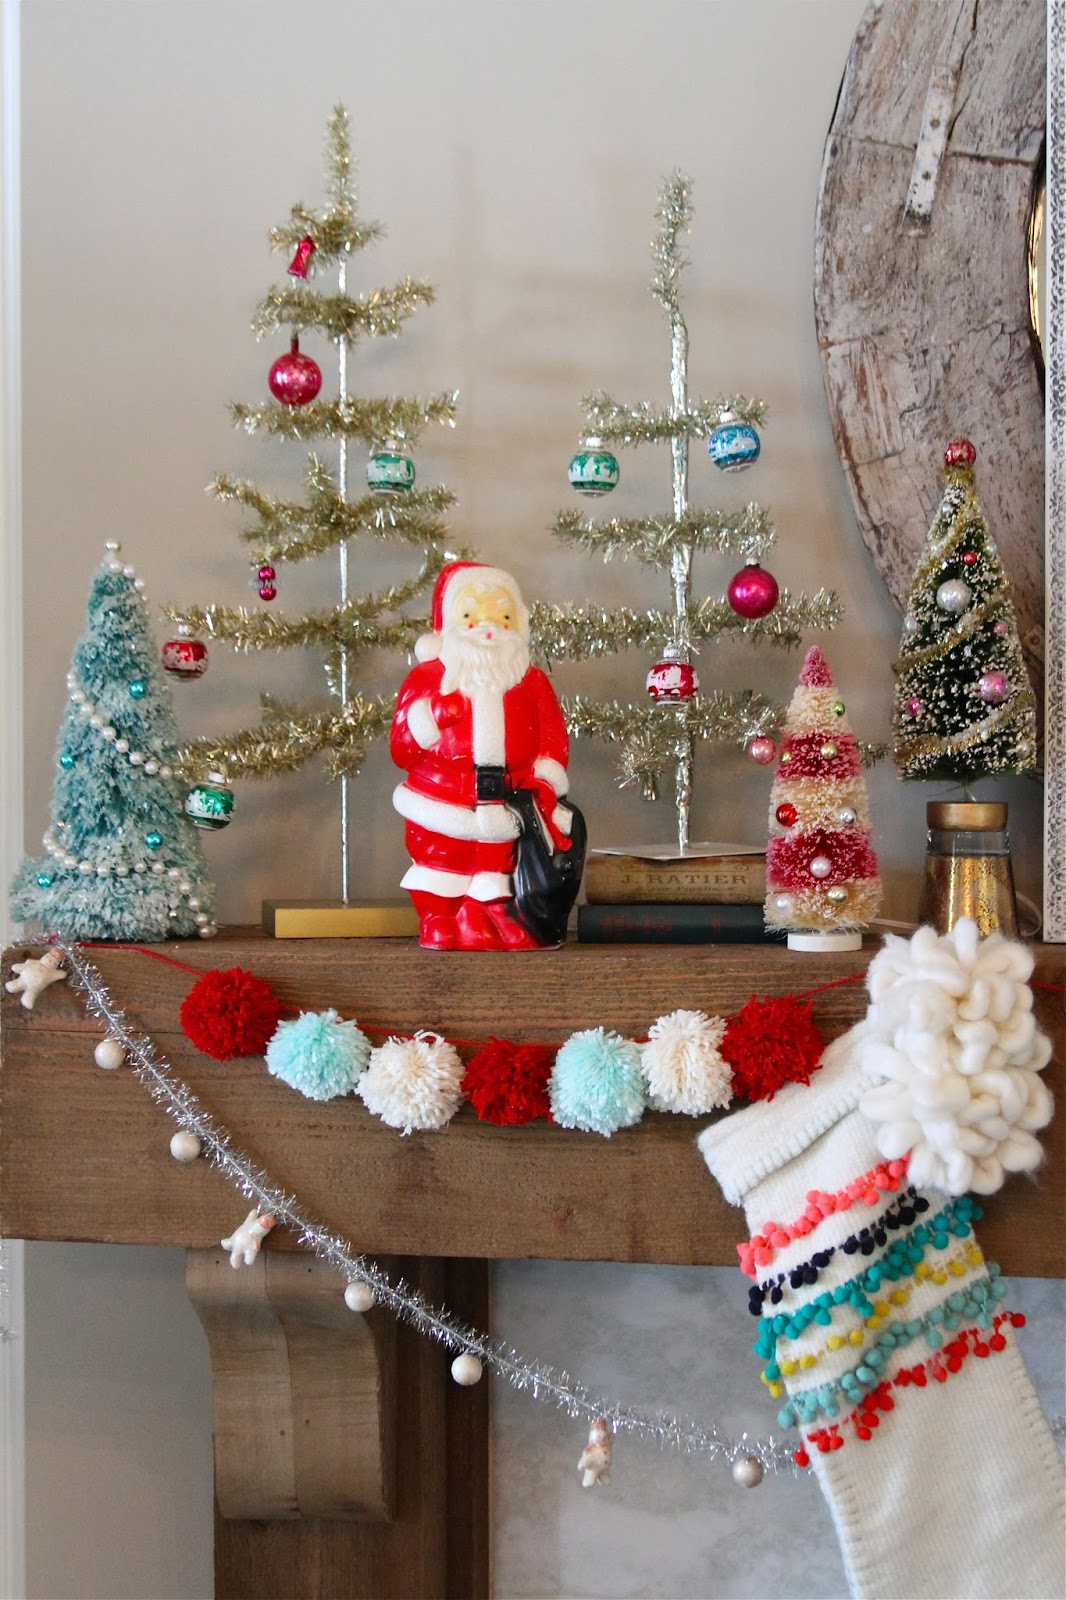 Vintage Christmas Mantel Decorations : Nesting in the bluegrass vintage inspired christmas mantel